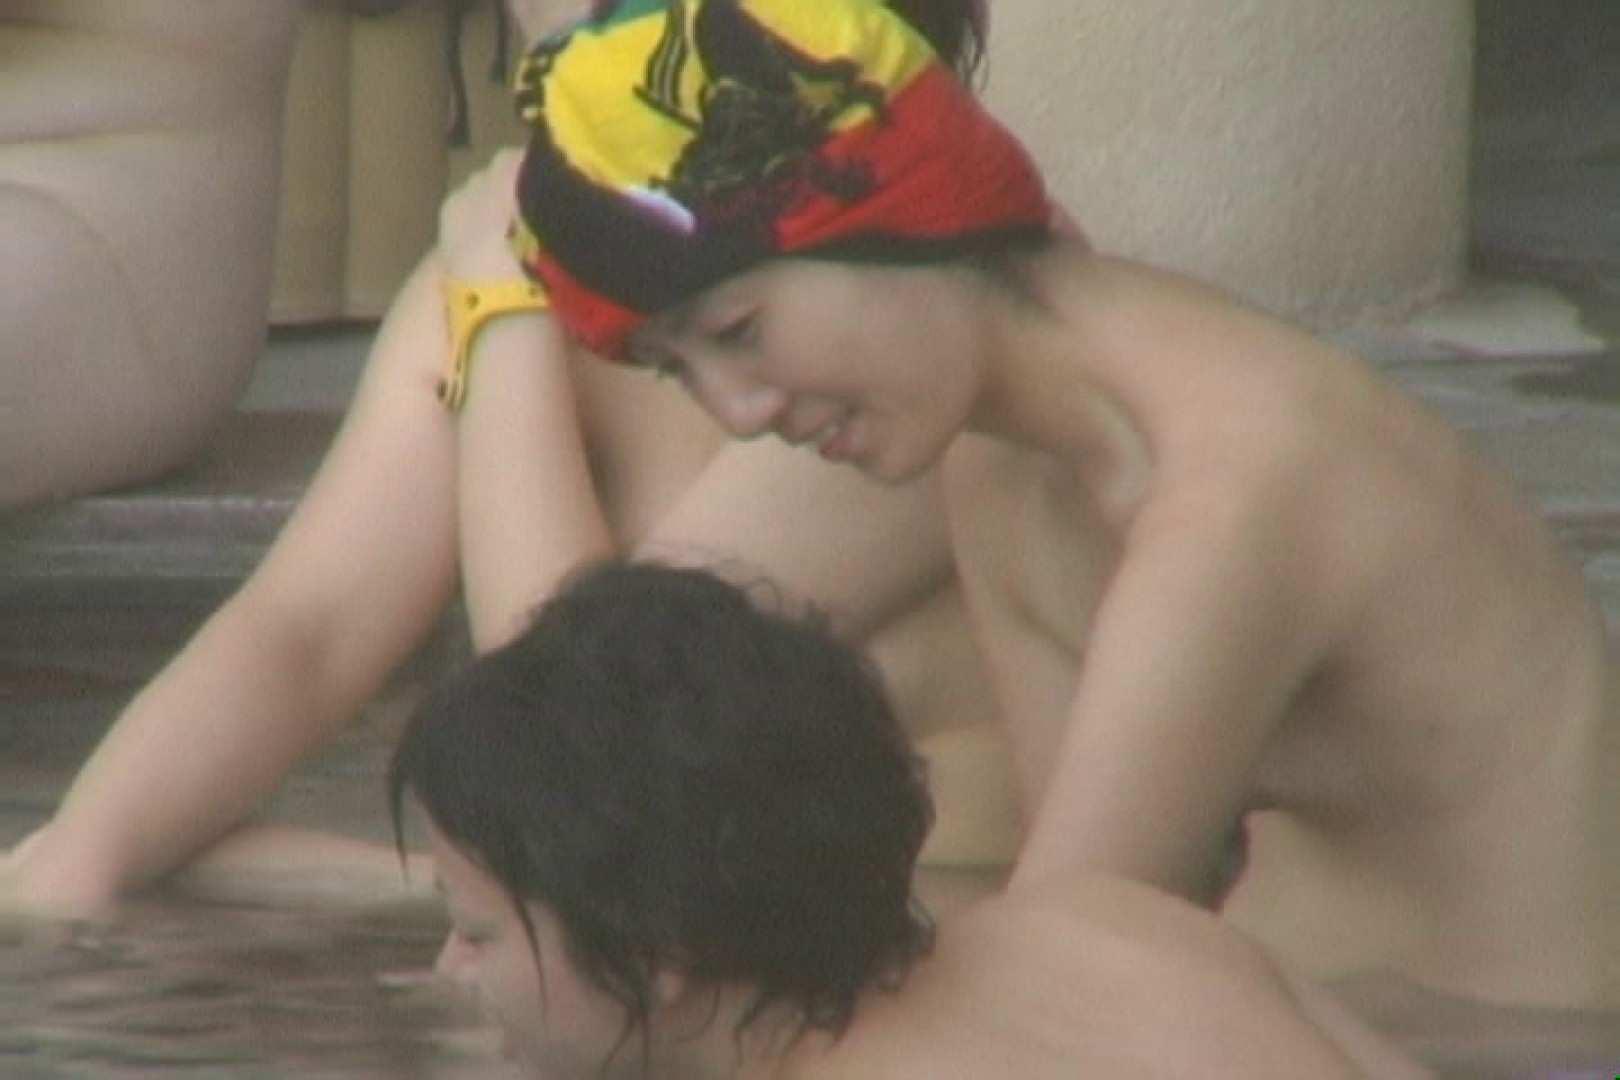 Aquaな露天風呂Vol.61【VIP限定】 OLセックス   盗撮  72画像 67